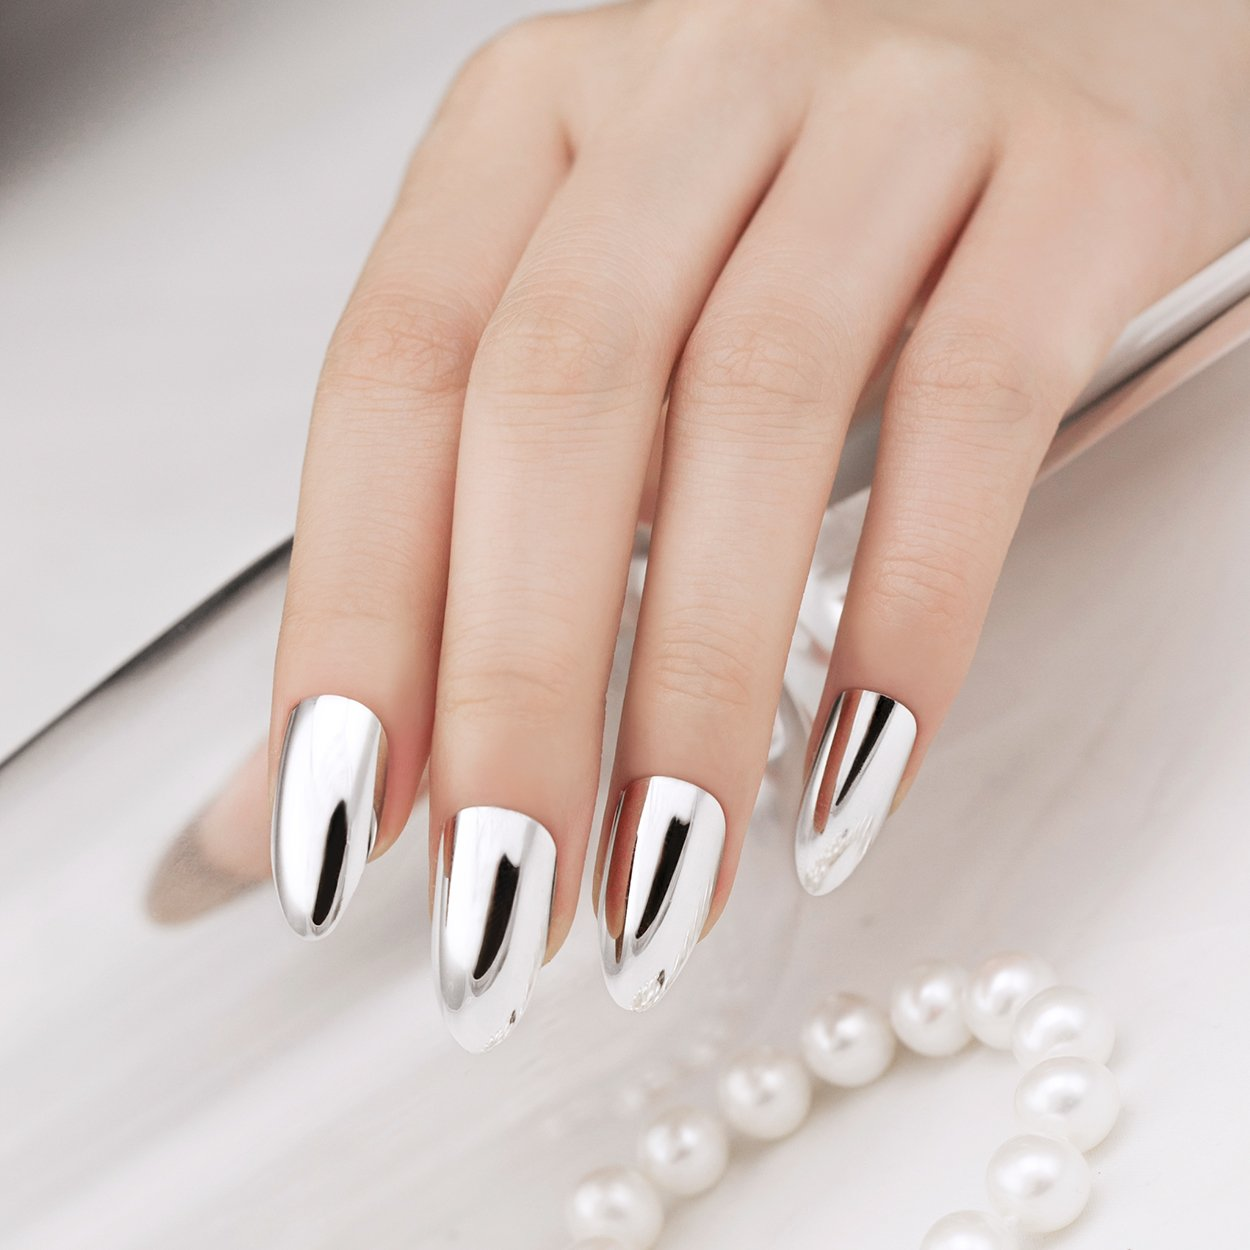 ArtPlus 24pcs Silver Metallic Chrome False Nails with Glue Full Cover Stilleto Fake Nails Art by A+ ArtPlus